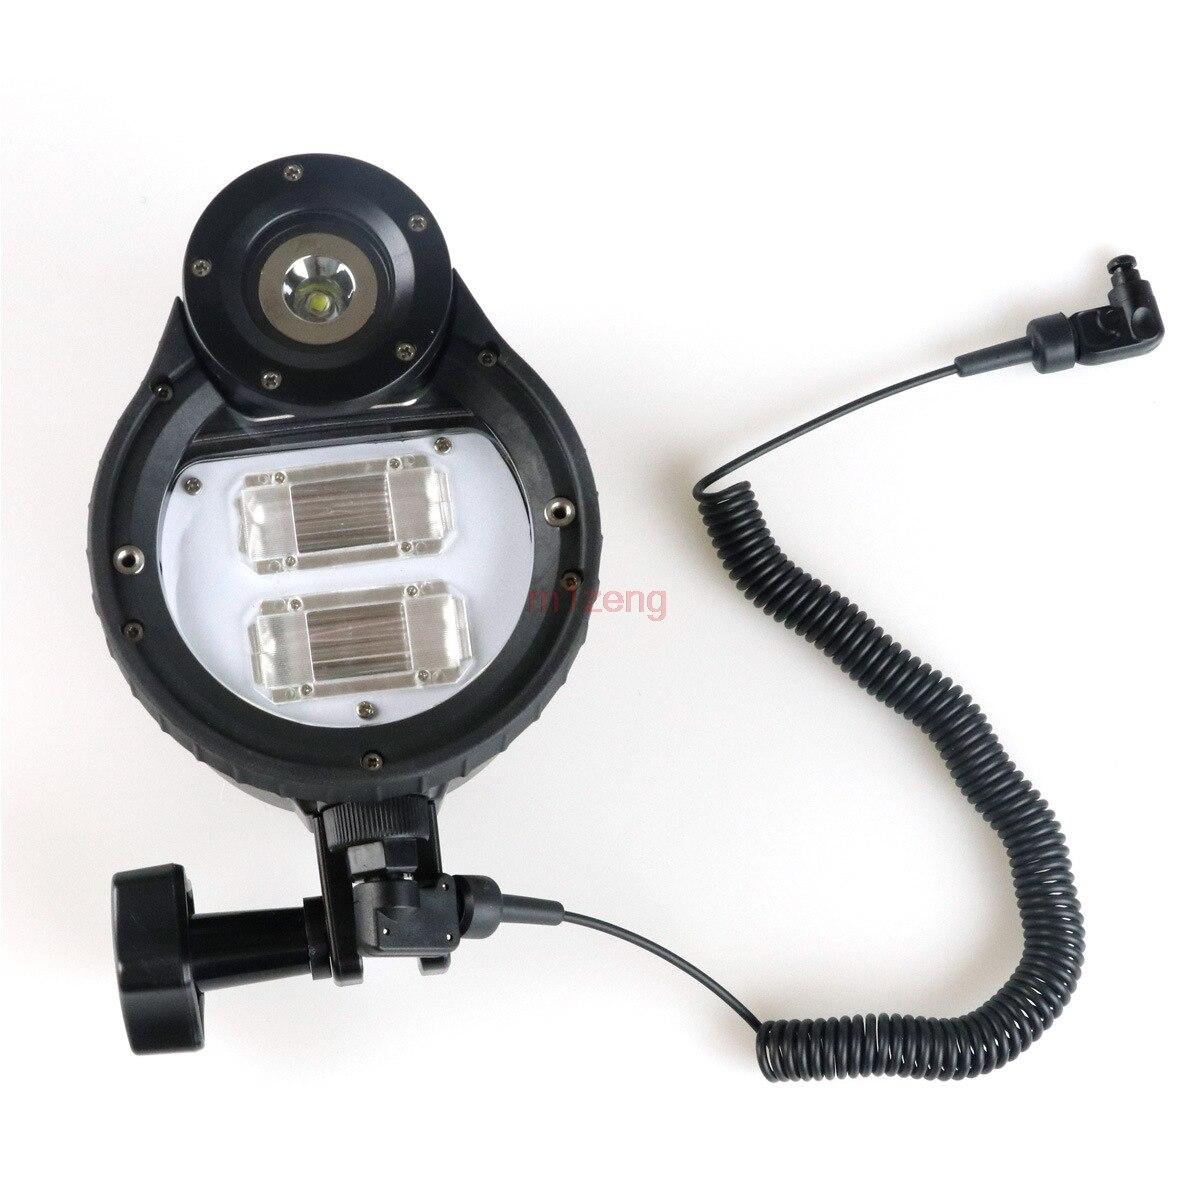 ST100 Flash Strobe underwater waterproof Light lamp For camera Housings Diving Case bag